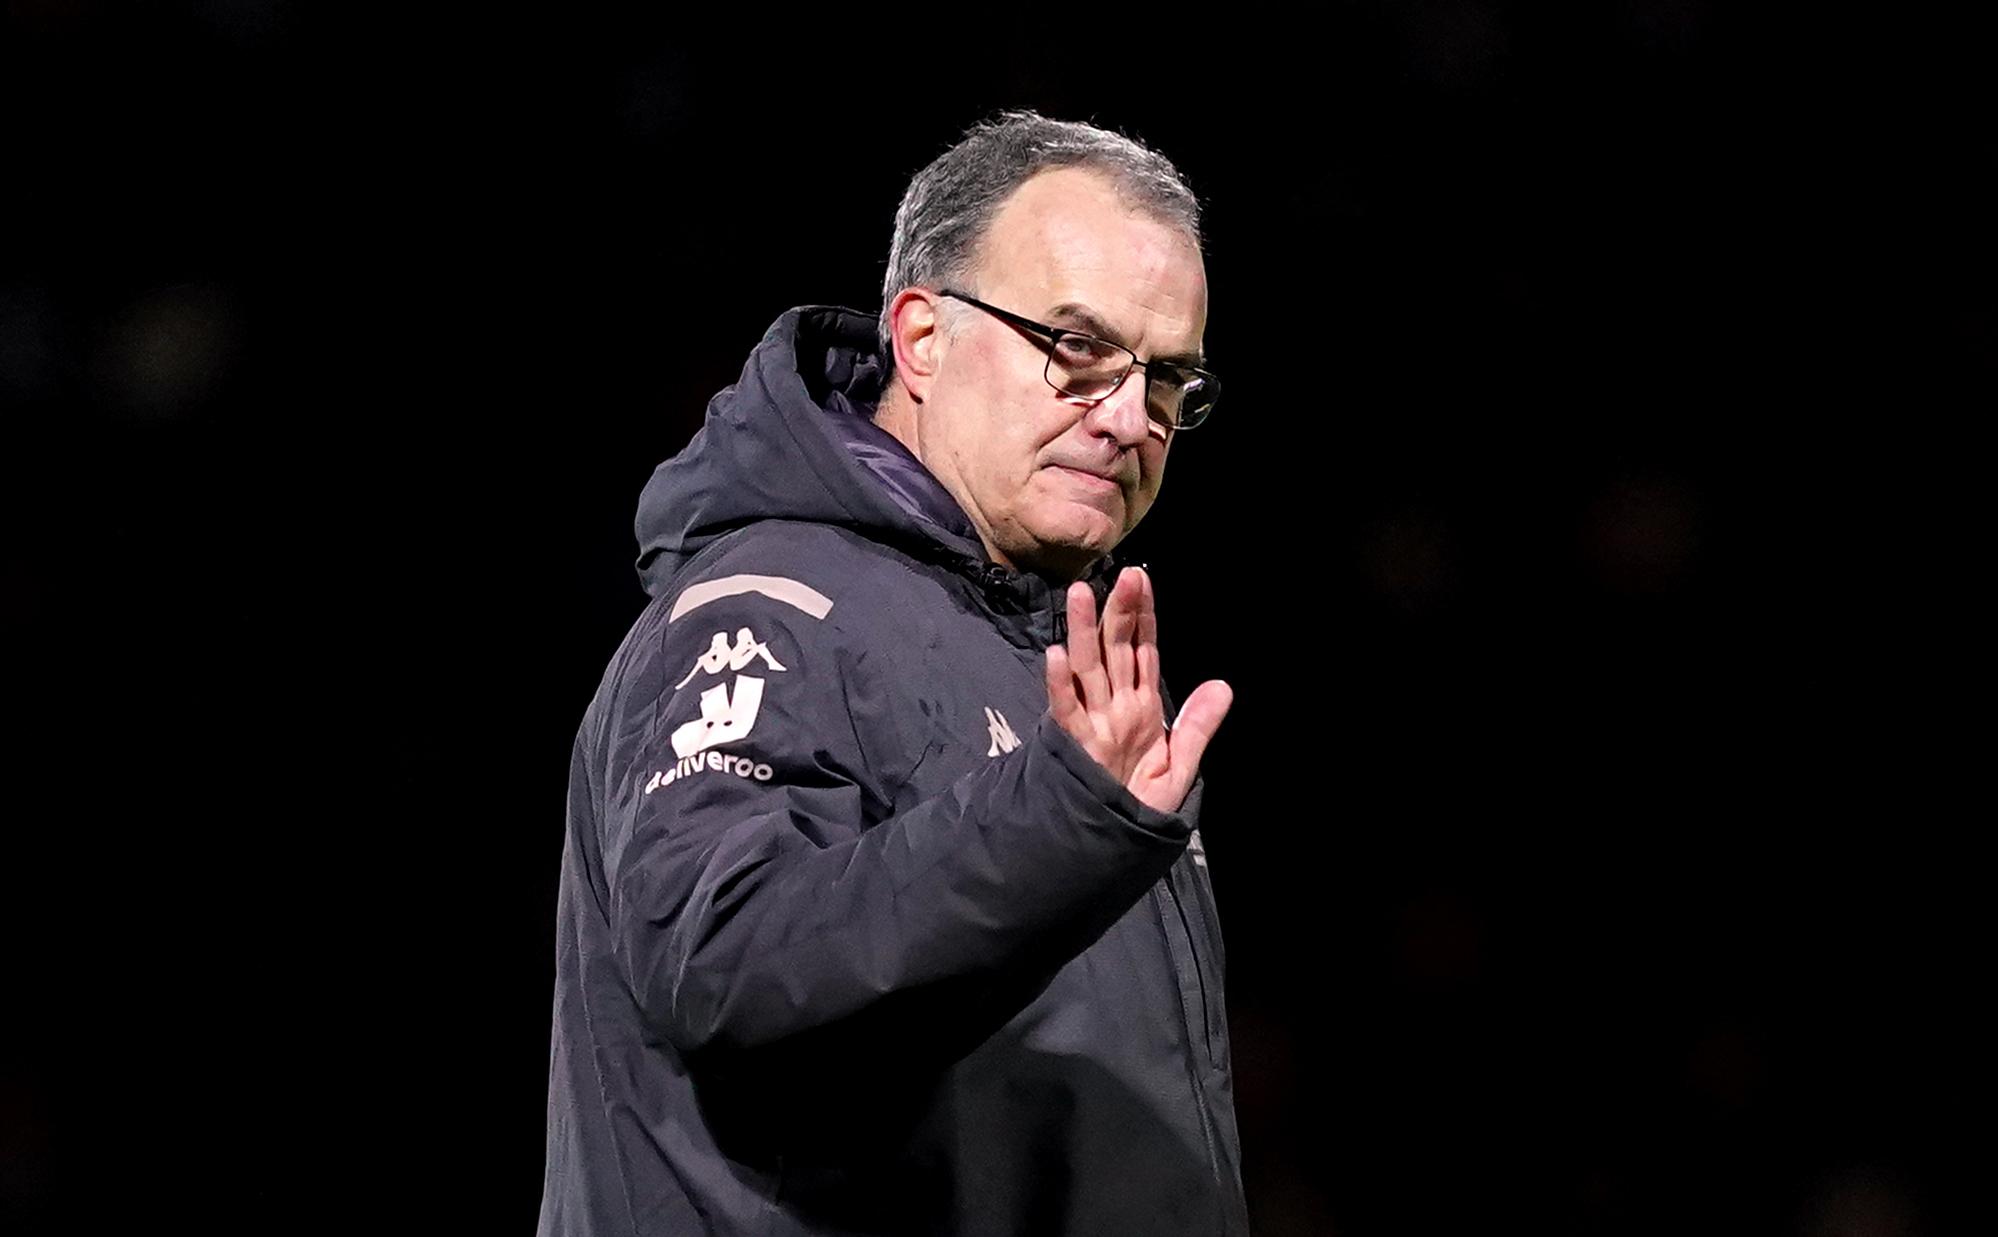 Football betting tips: Bamford to continue hot streak in Leeds vs Wolves goalfest – Premier League predictions